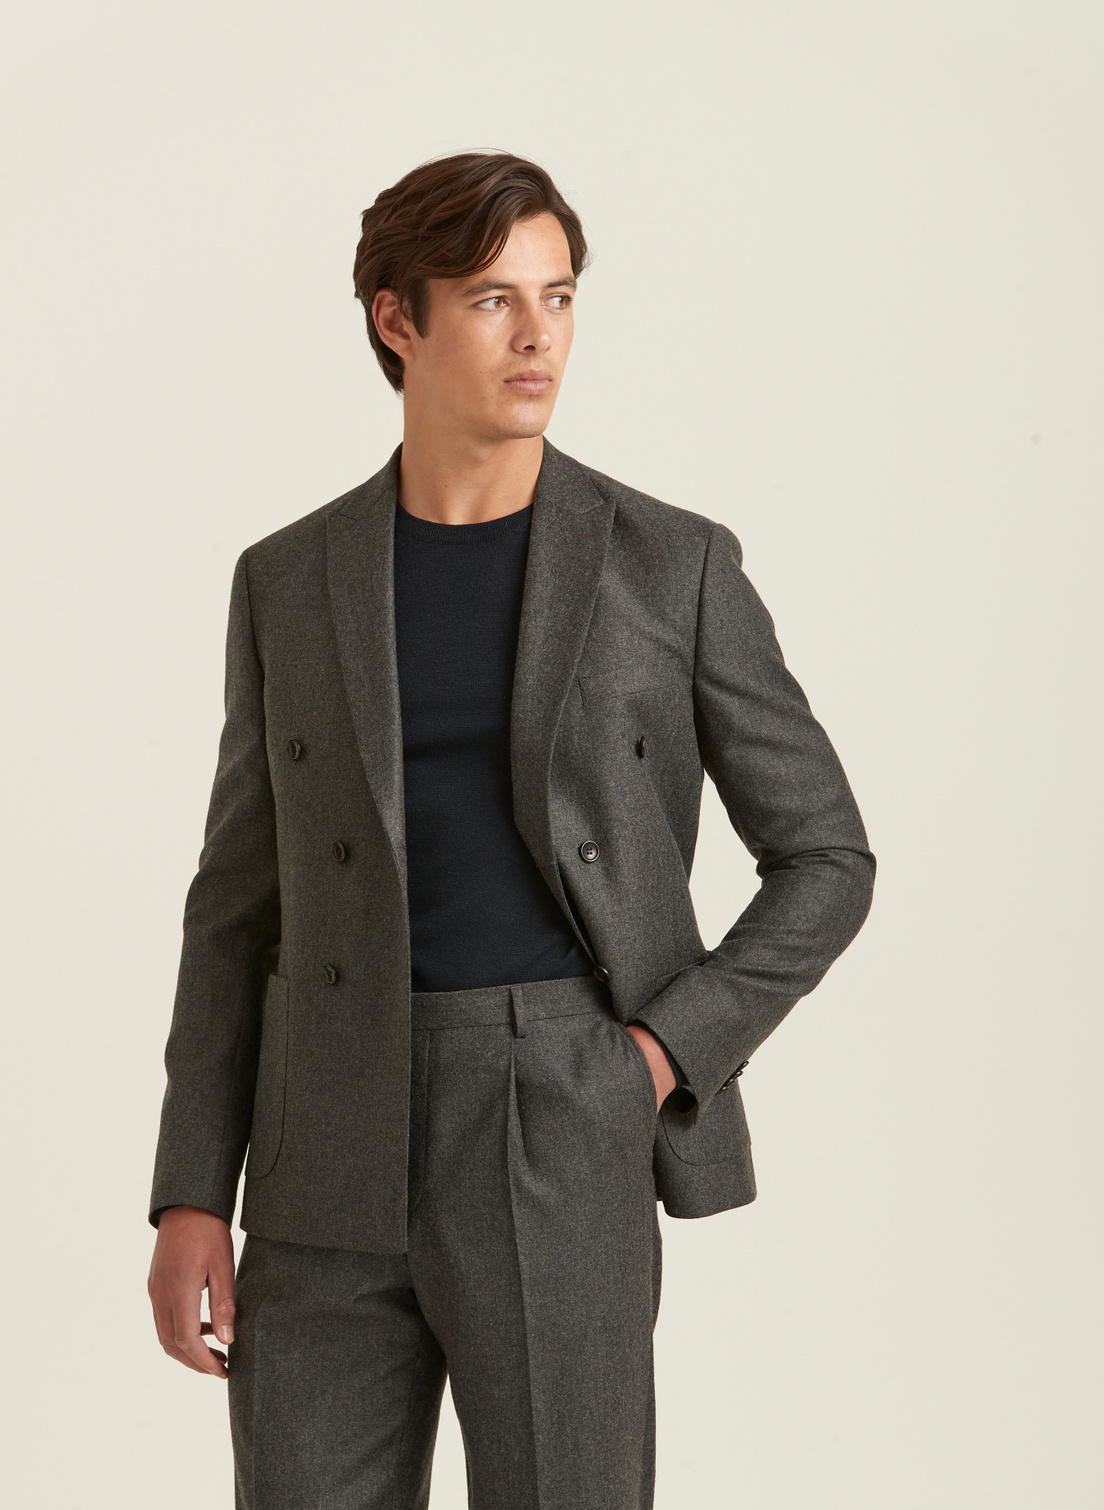 Roger Flannel Suit Blazer